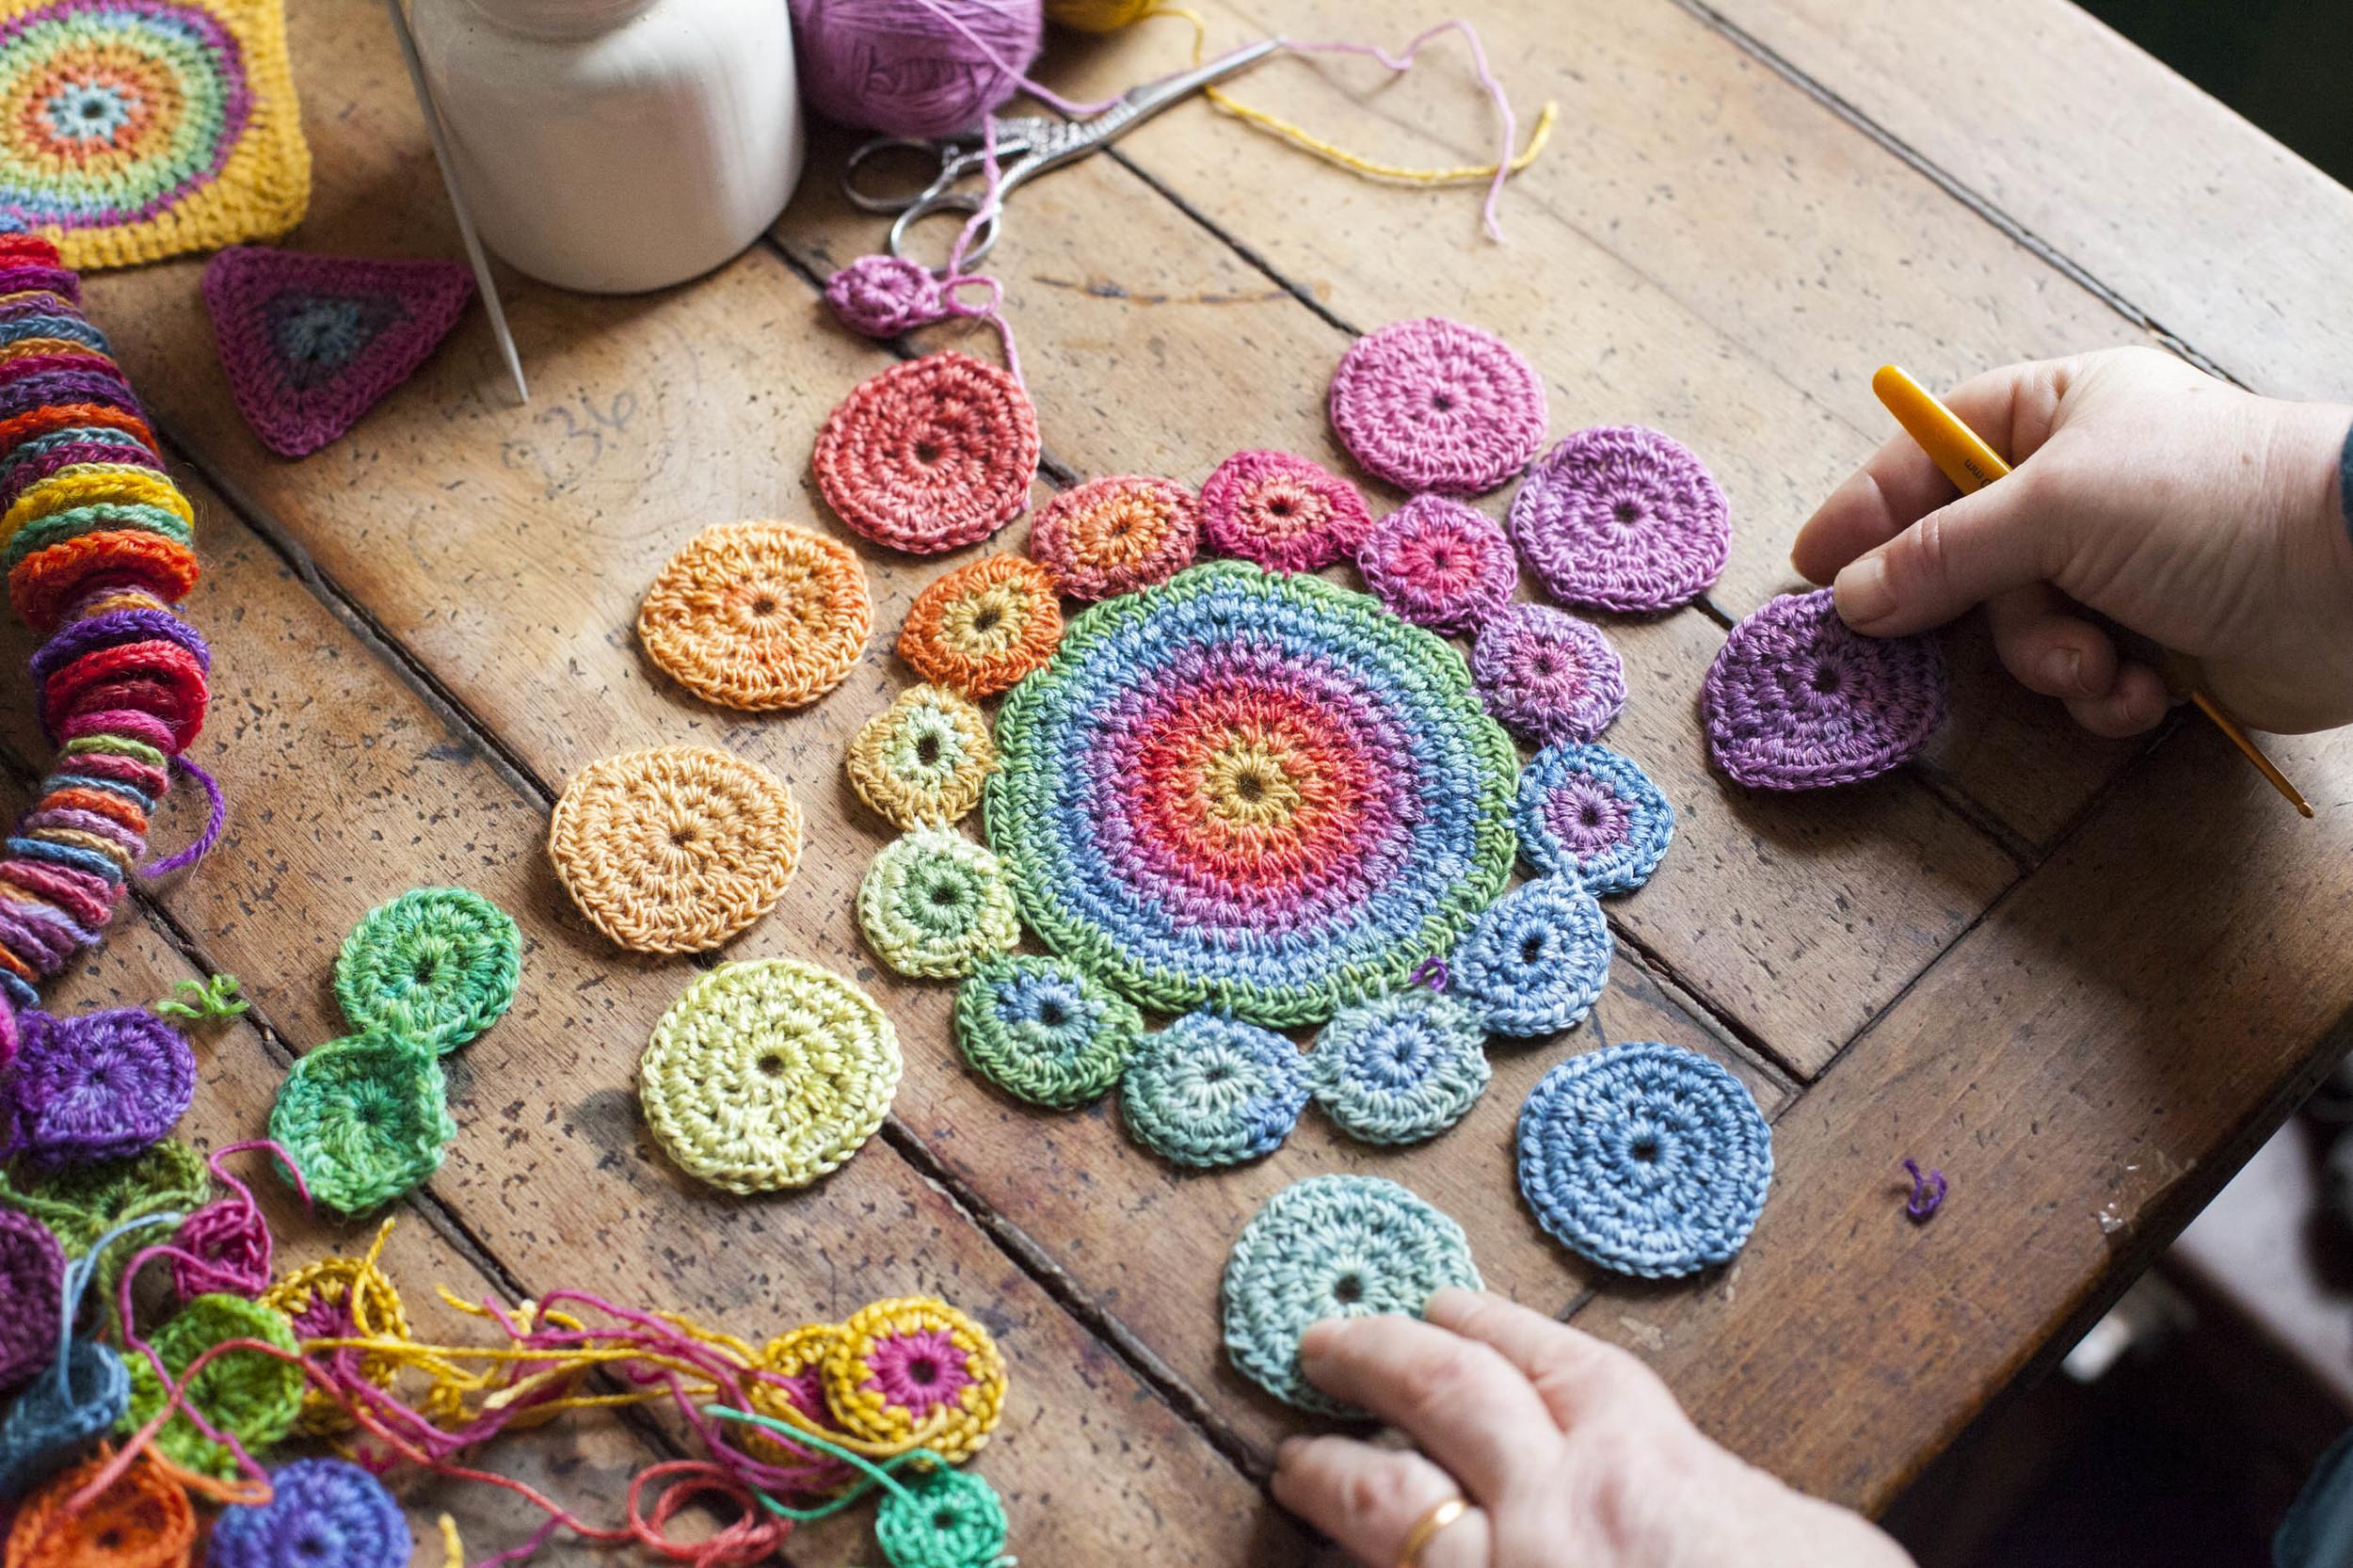 074_Crochet.jpg